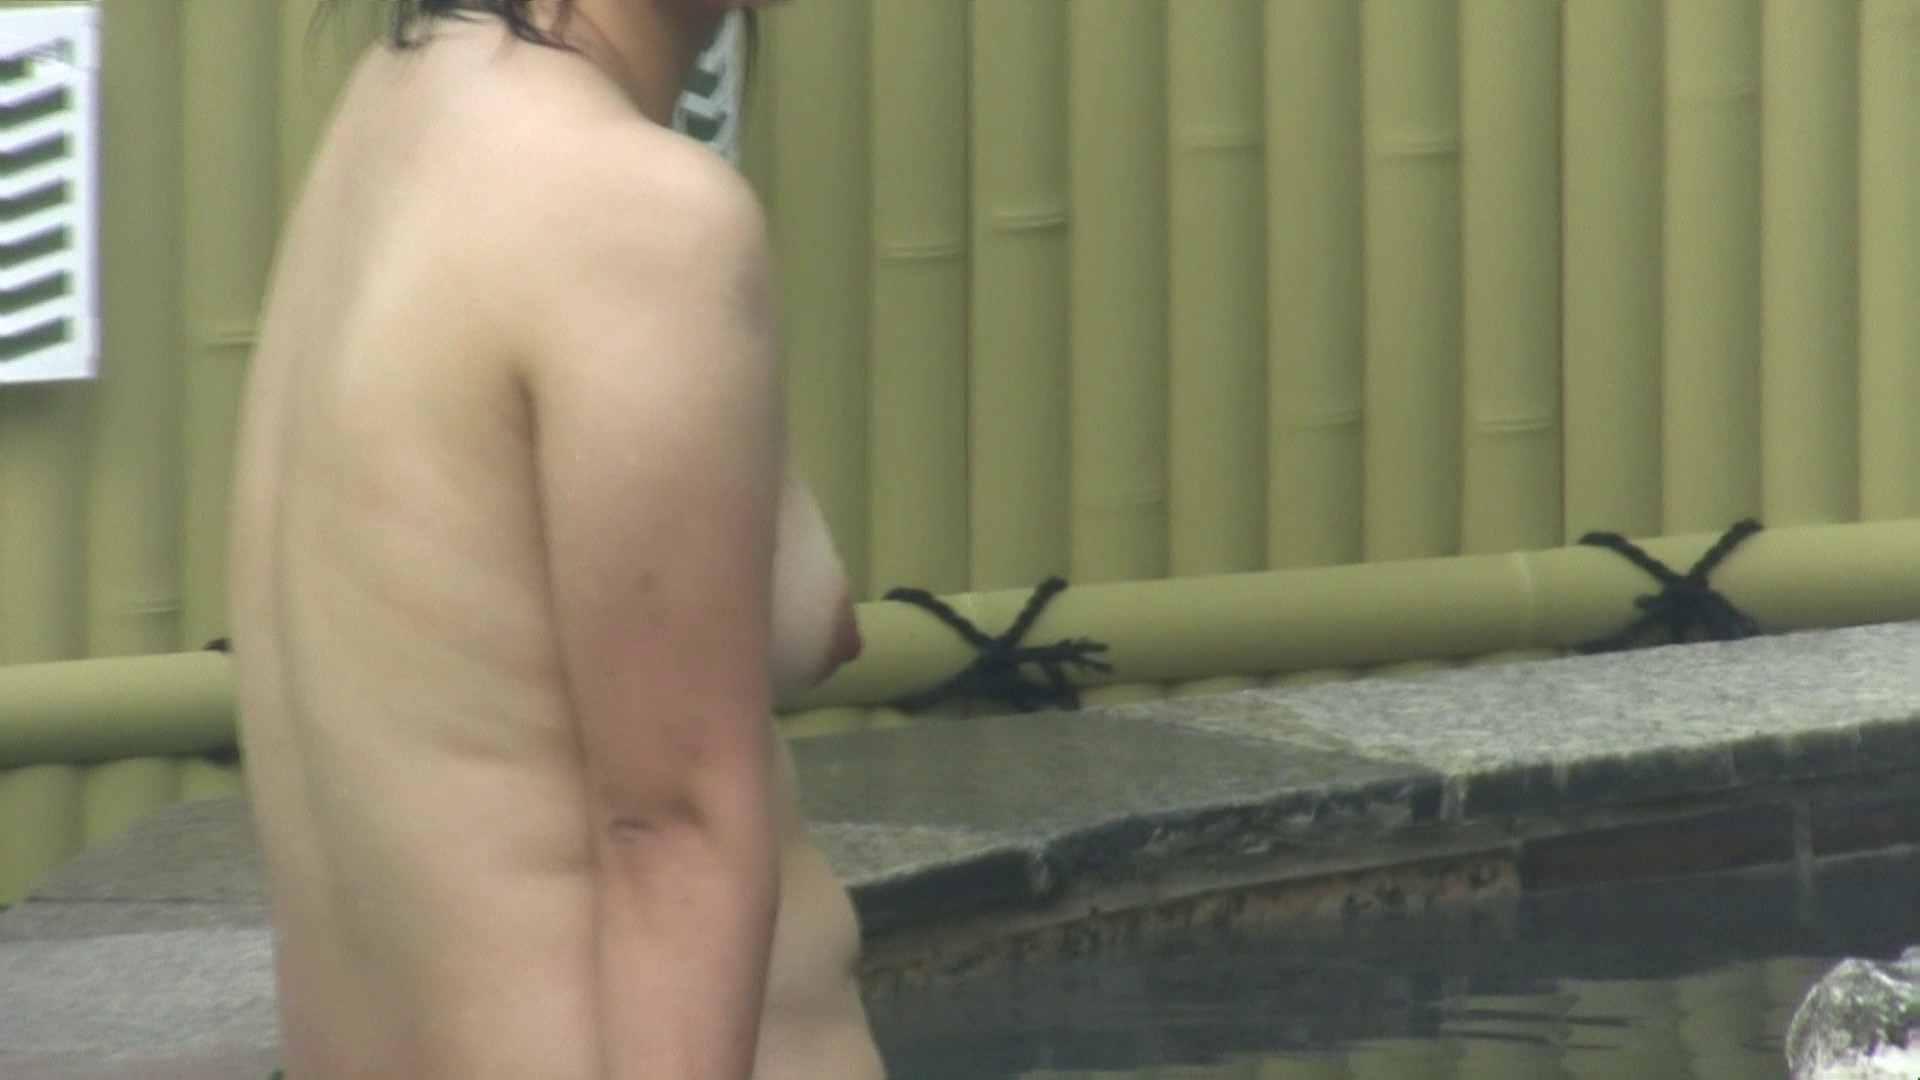 Aquaな露天風呂Vol.604 露天風呂編 | 盗撮シリーズ  89PIX 47